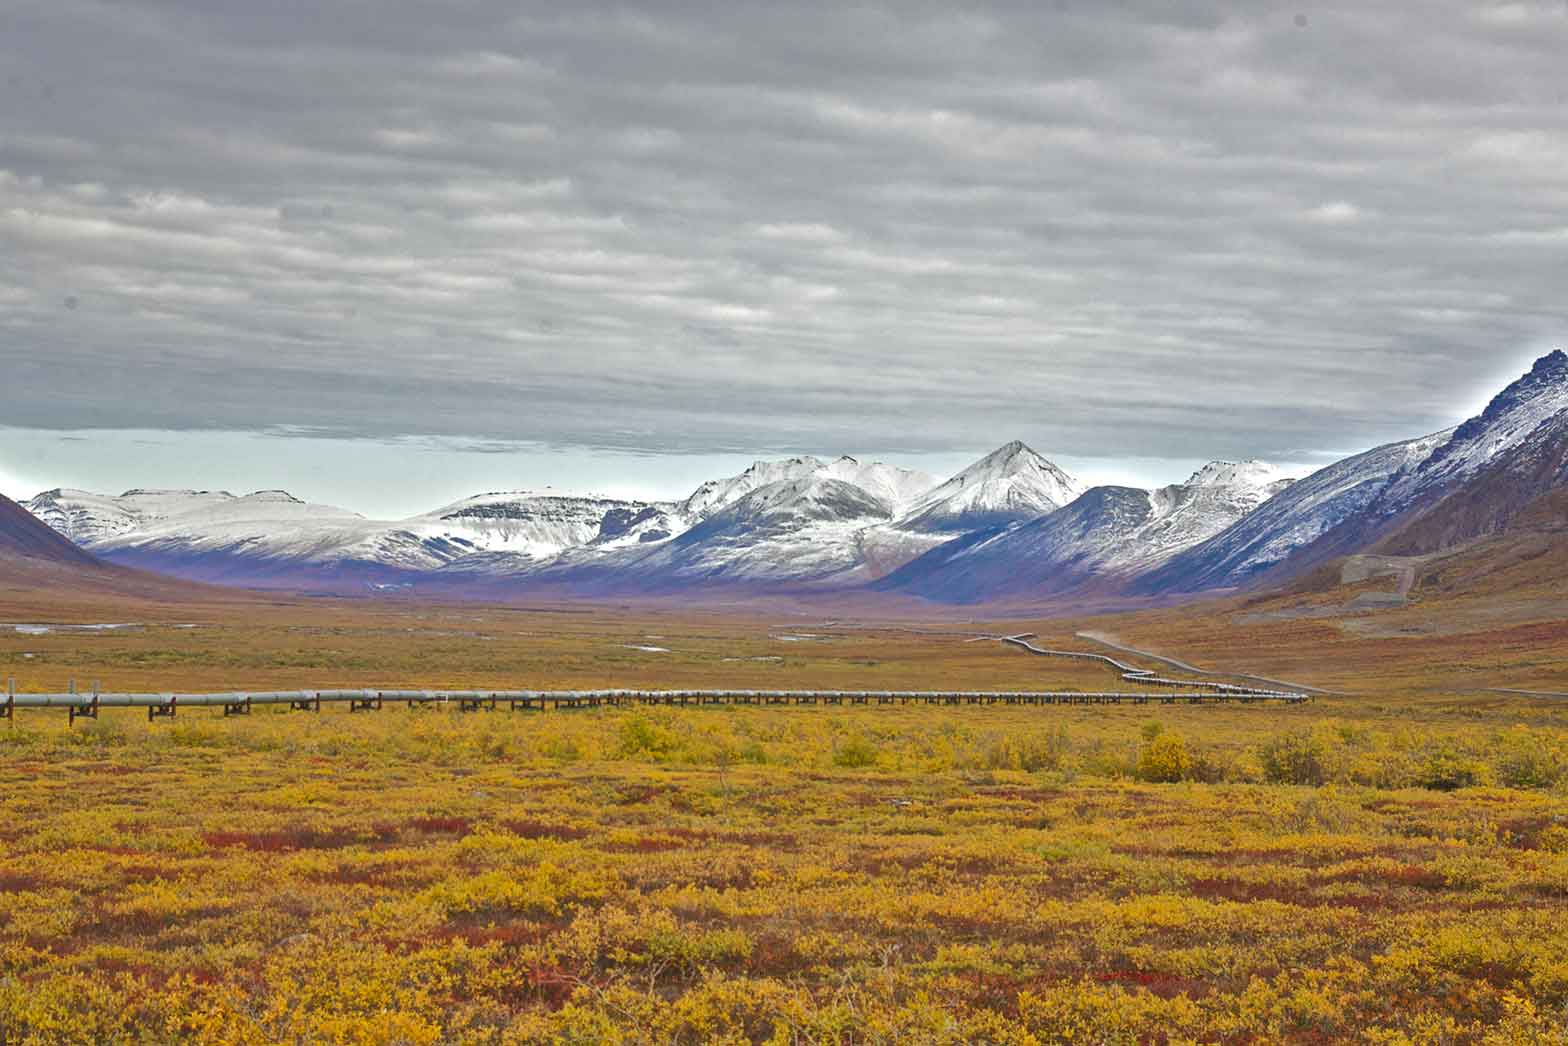 Alaska's landscape